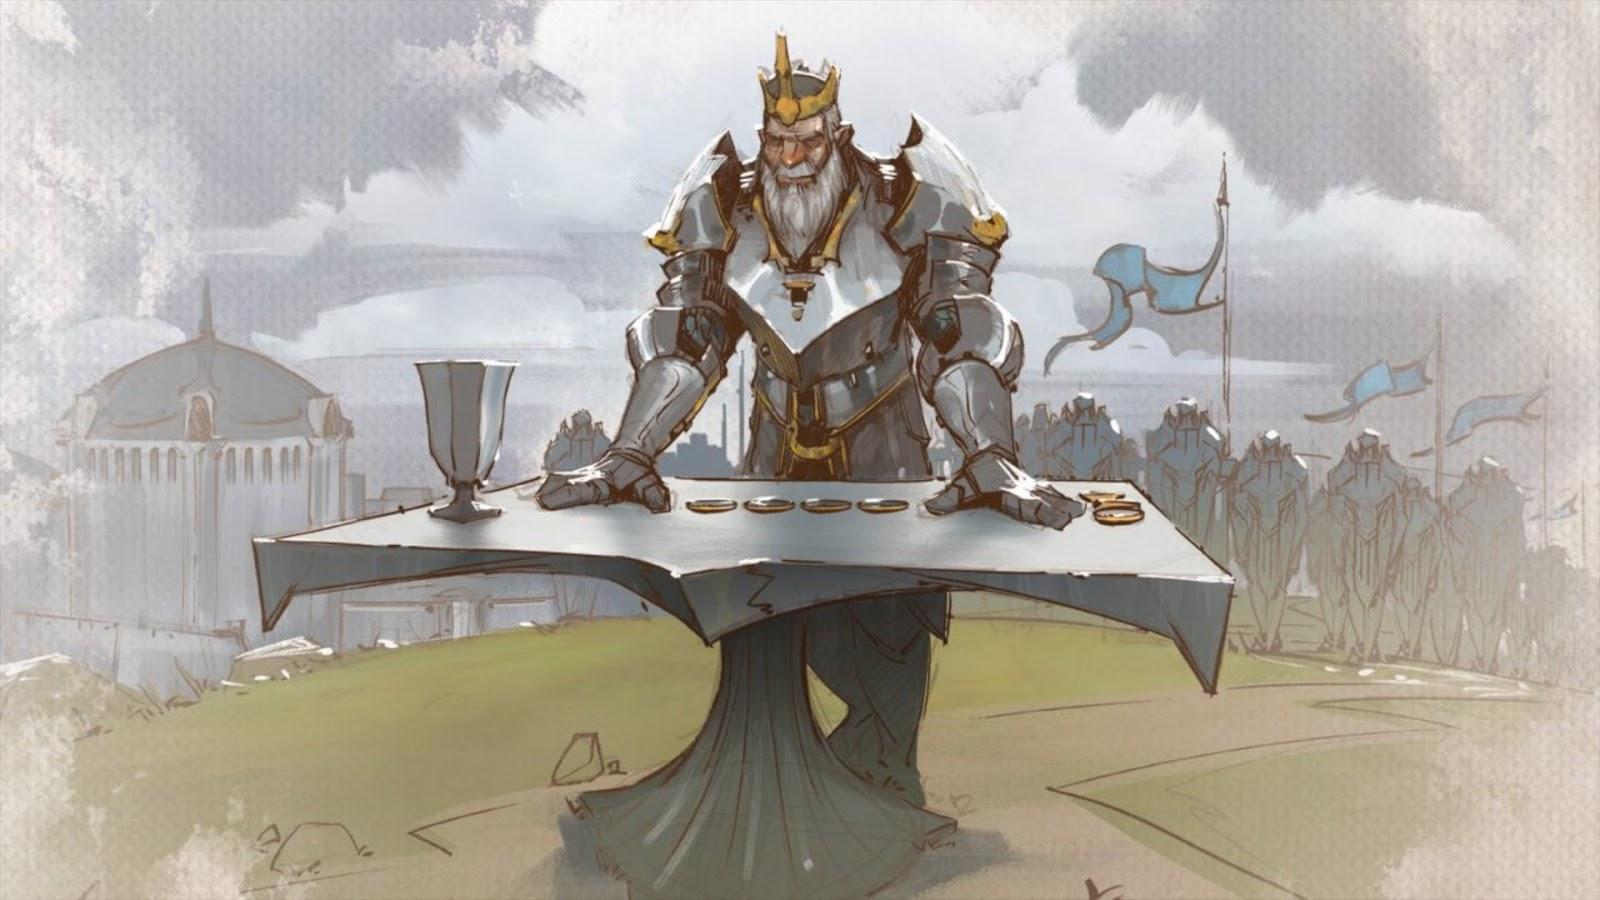 Board Game News Collider Riot GAmes Mech Vs Minions Follow Up Tellstones Kings Gambit